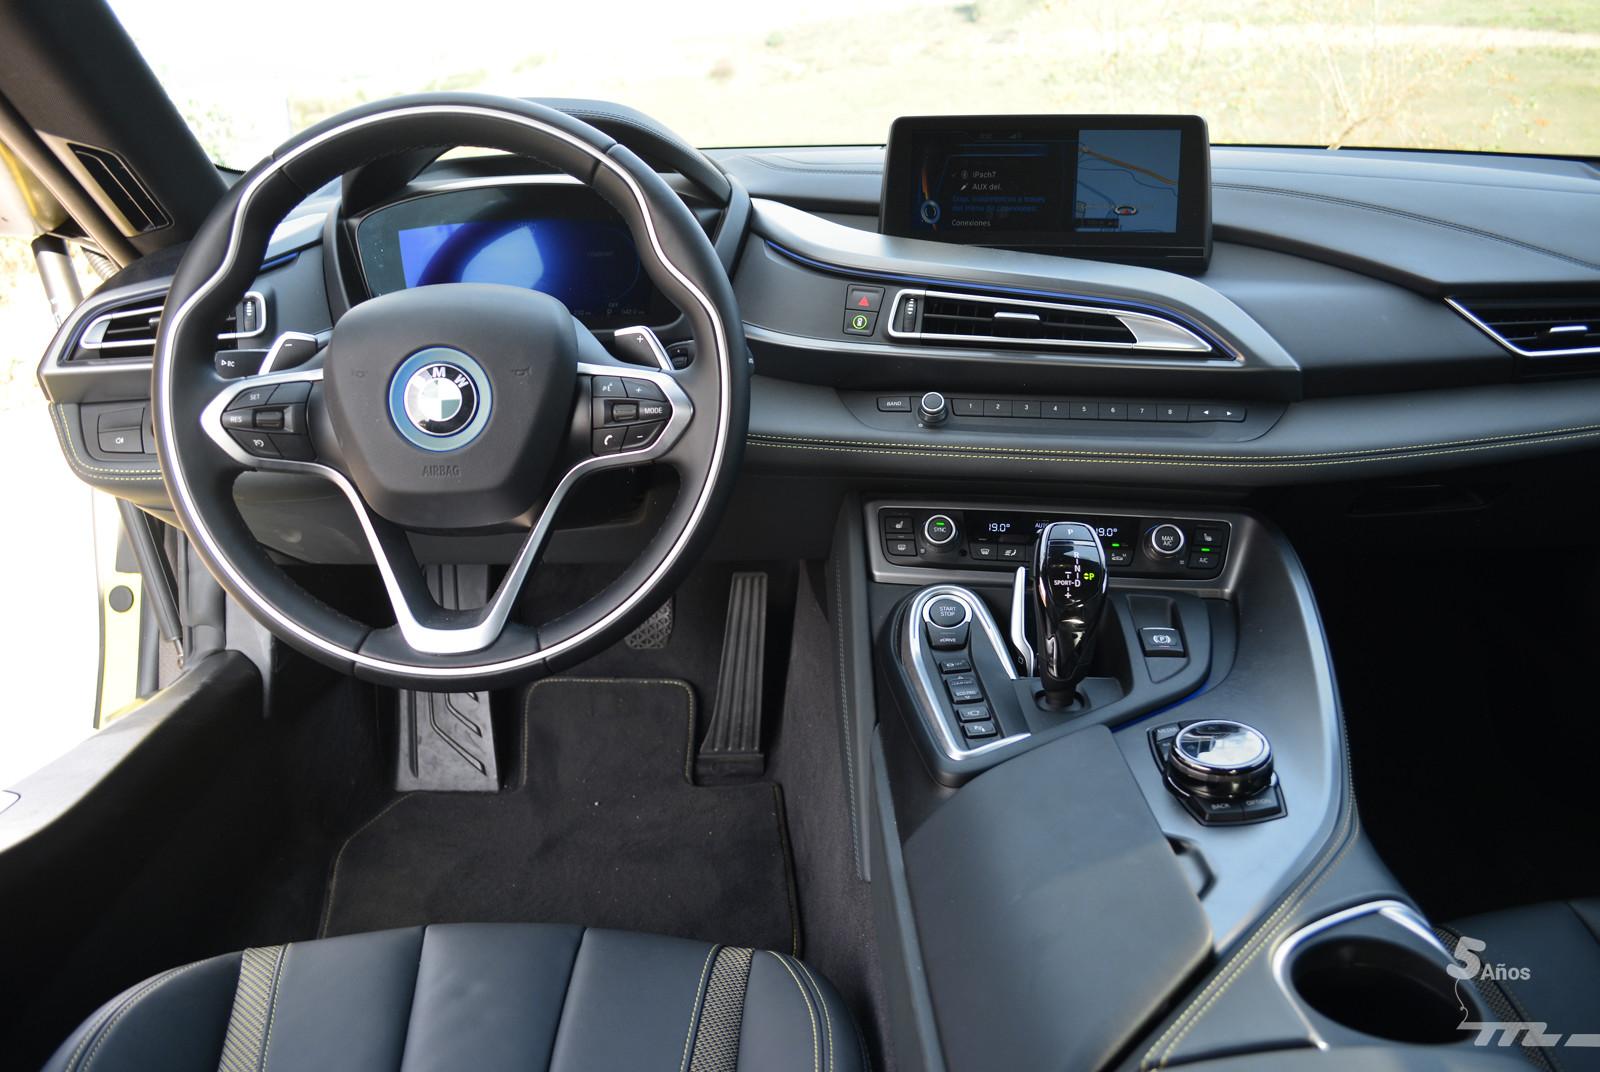 Foto de BMW i8 Protonic Frozen Yellow 2017 (15/21)